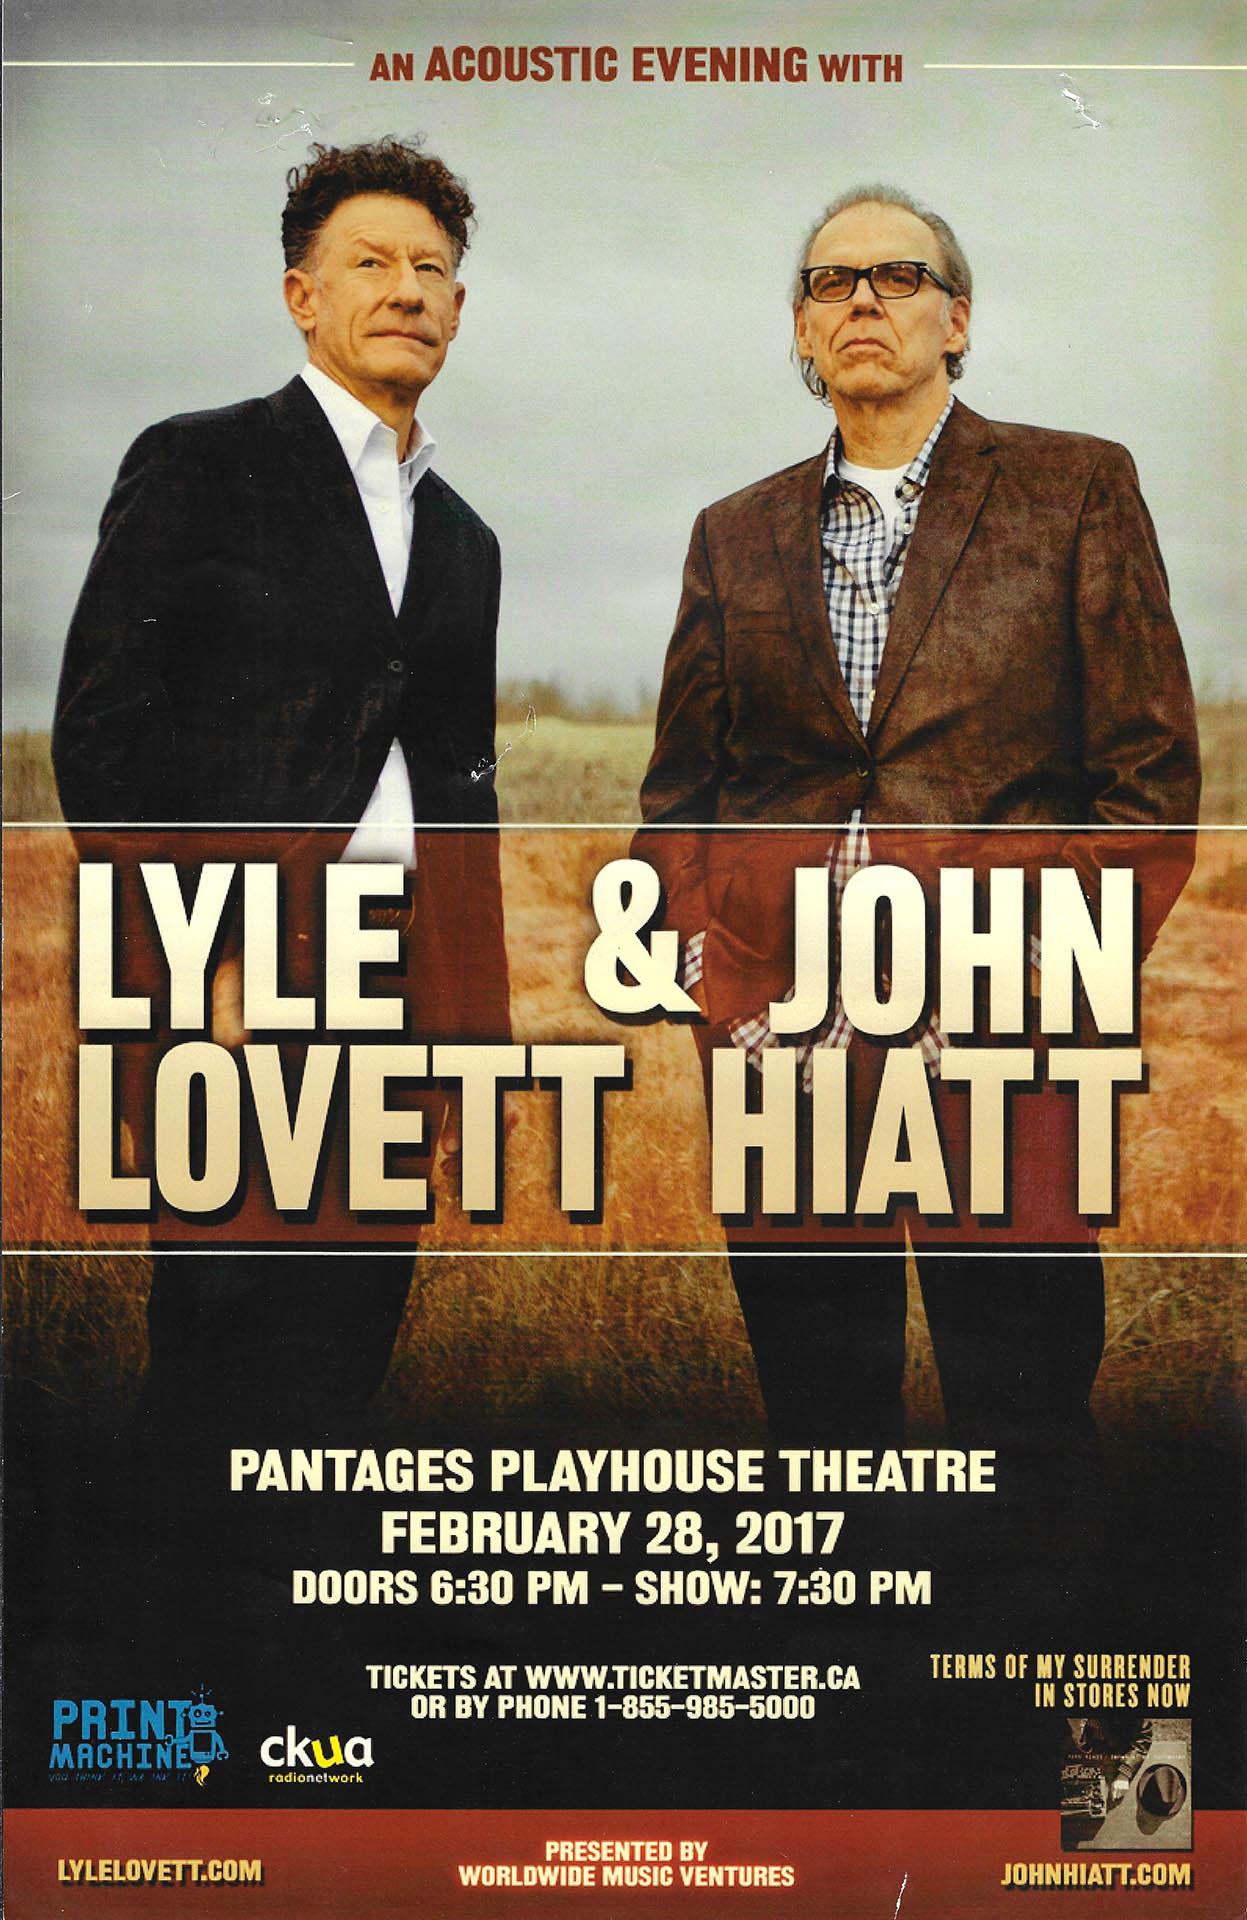 Lyle Lovett & John Hiatt – 2017